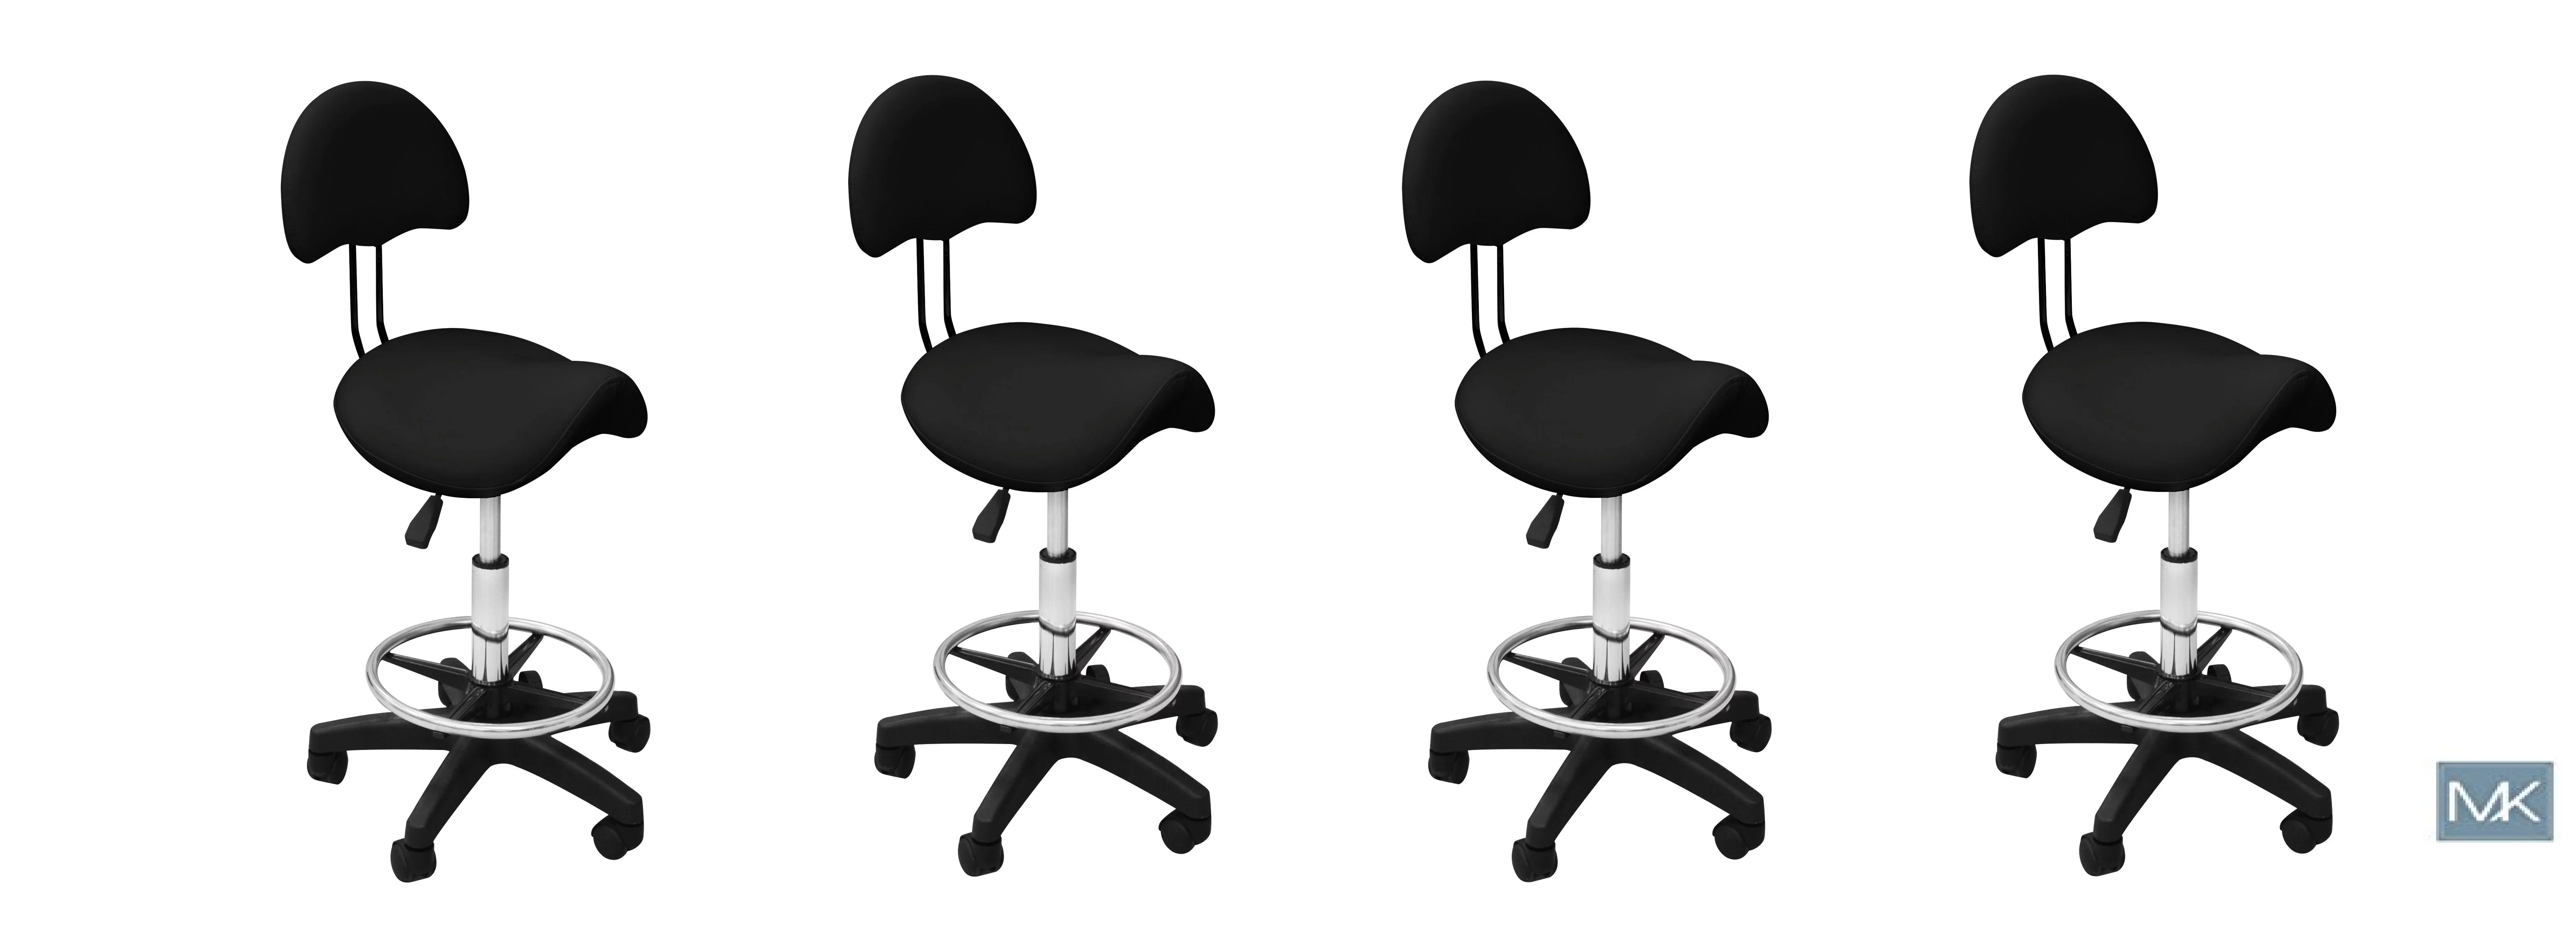 Set of 4 Esthetician Chair Technician Stool KELLY BLACK